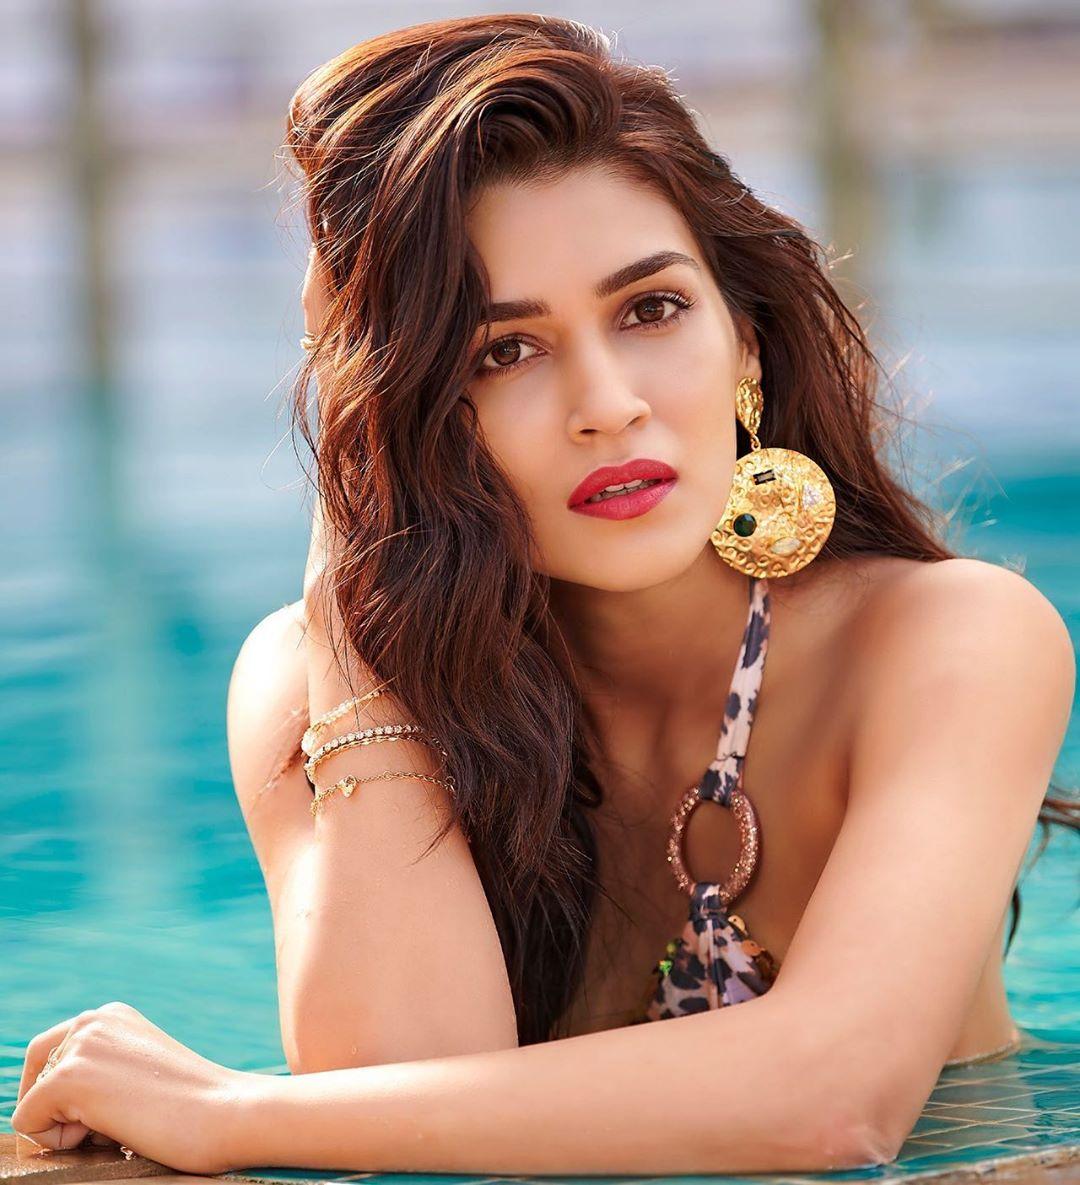 Bollywood Actress Kriti Sanon TOP 20 Instagram Photos Download - Celebrity Photos